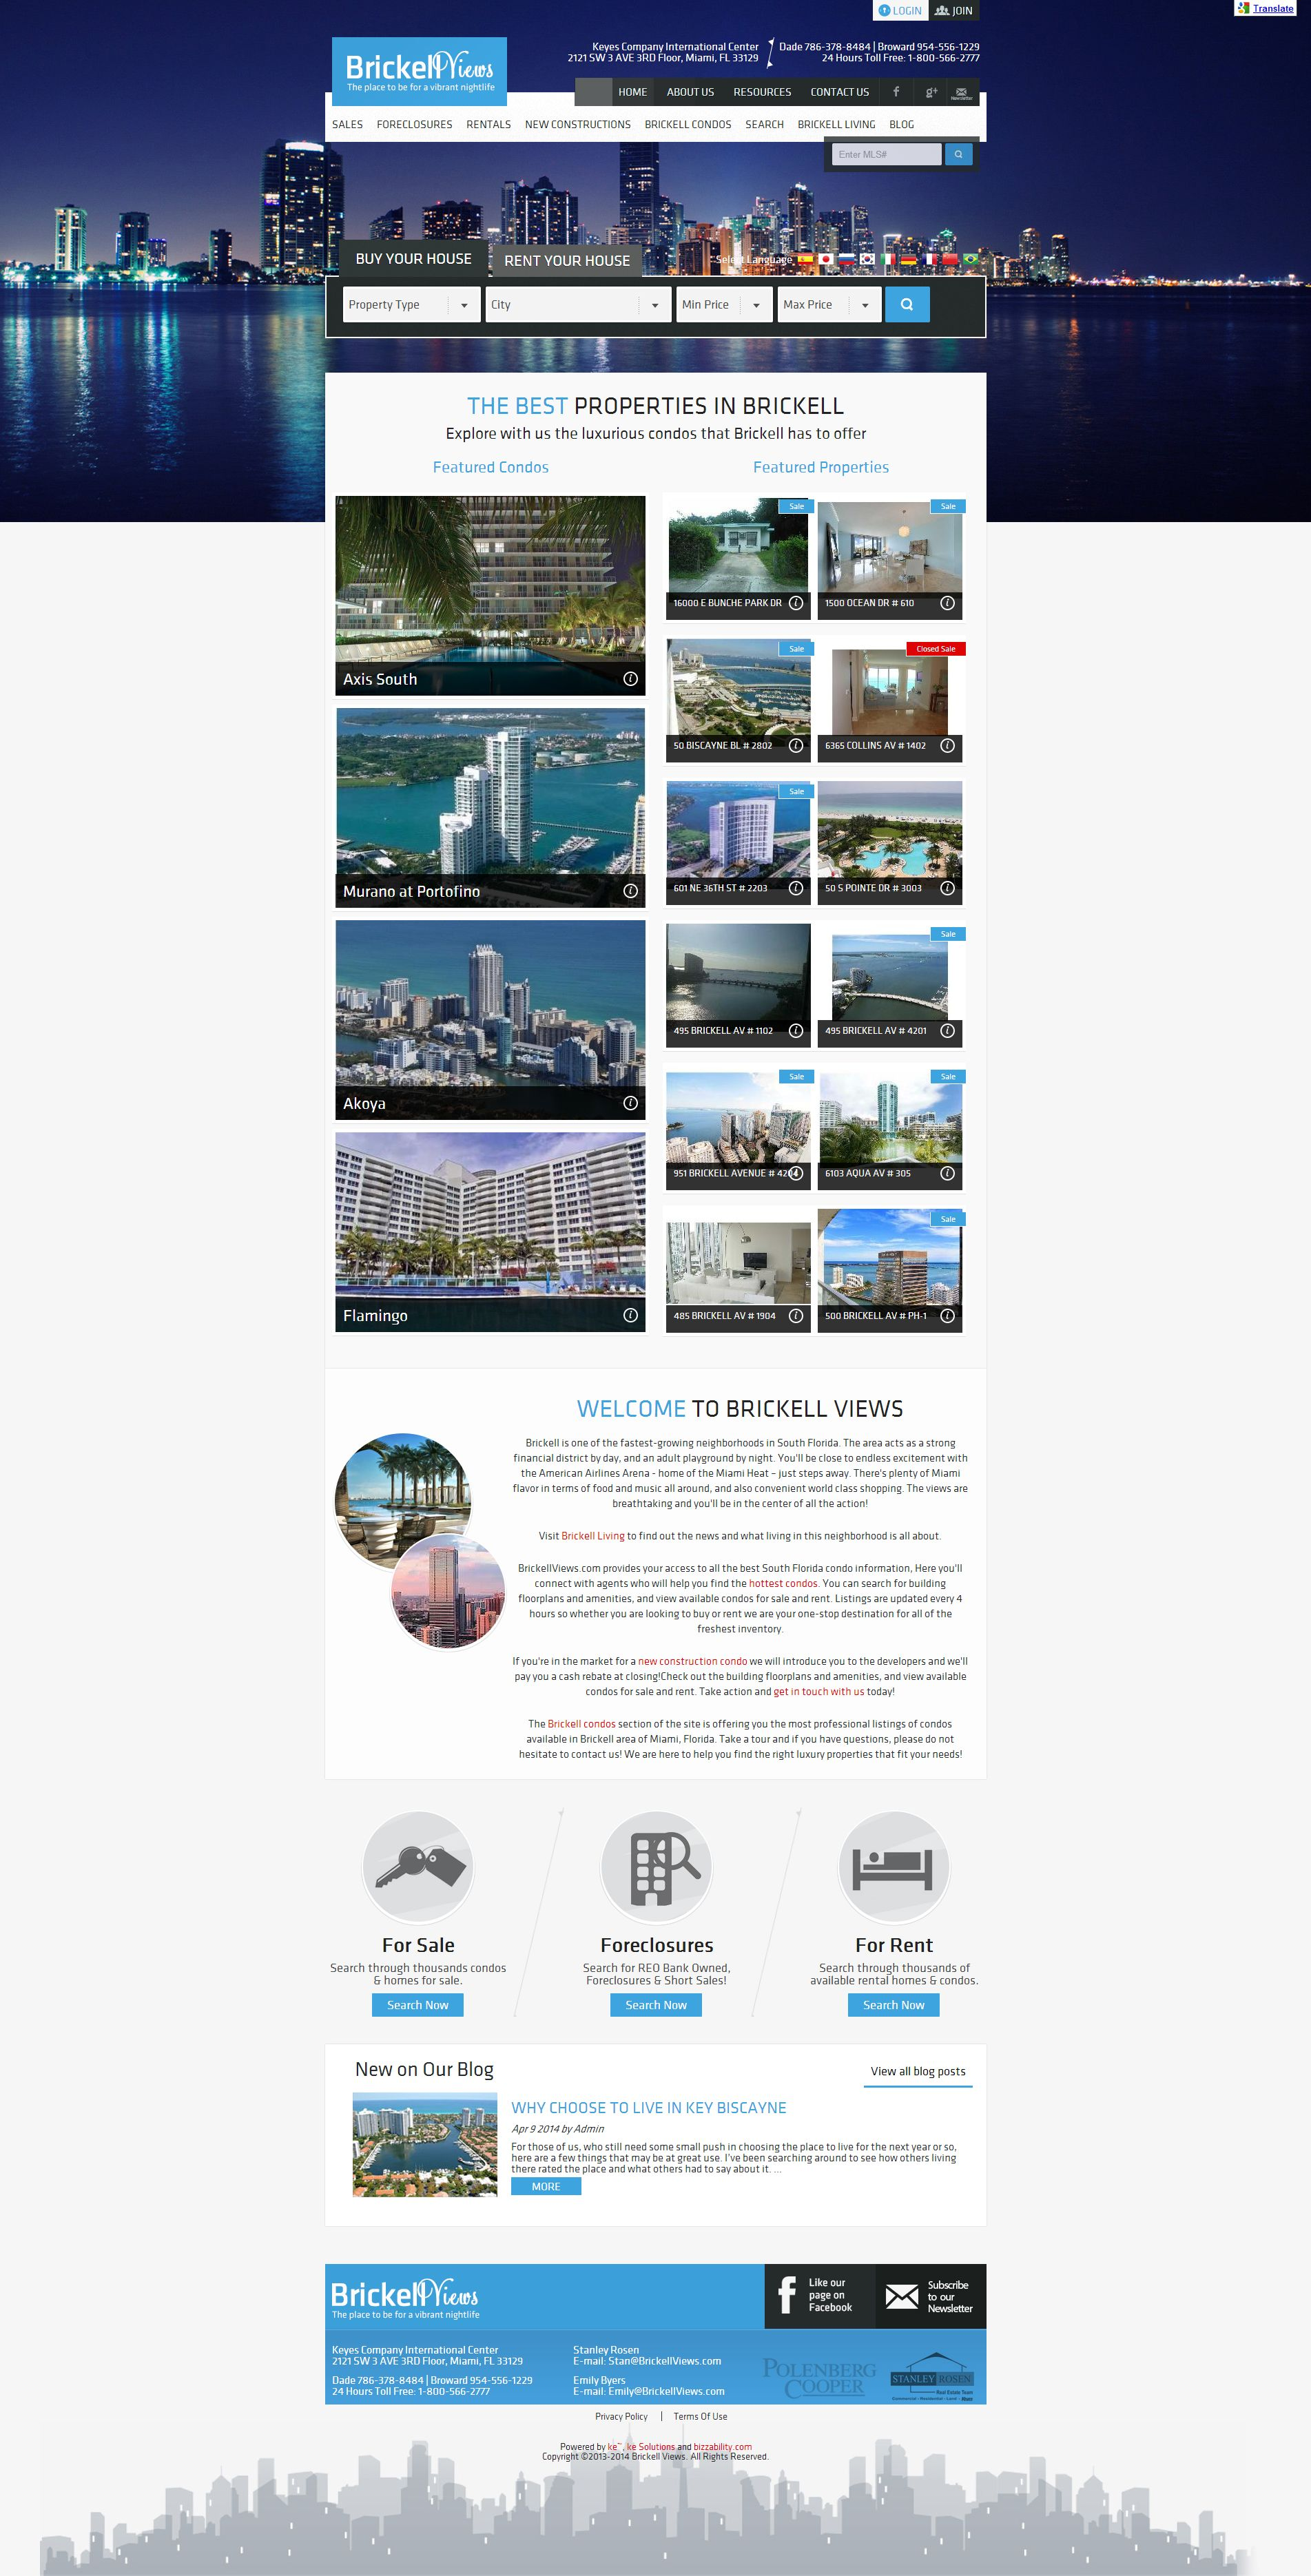 Brickell Views screenshot